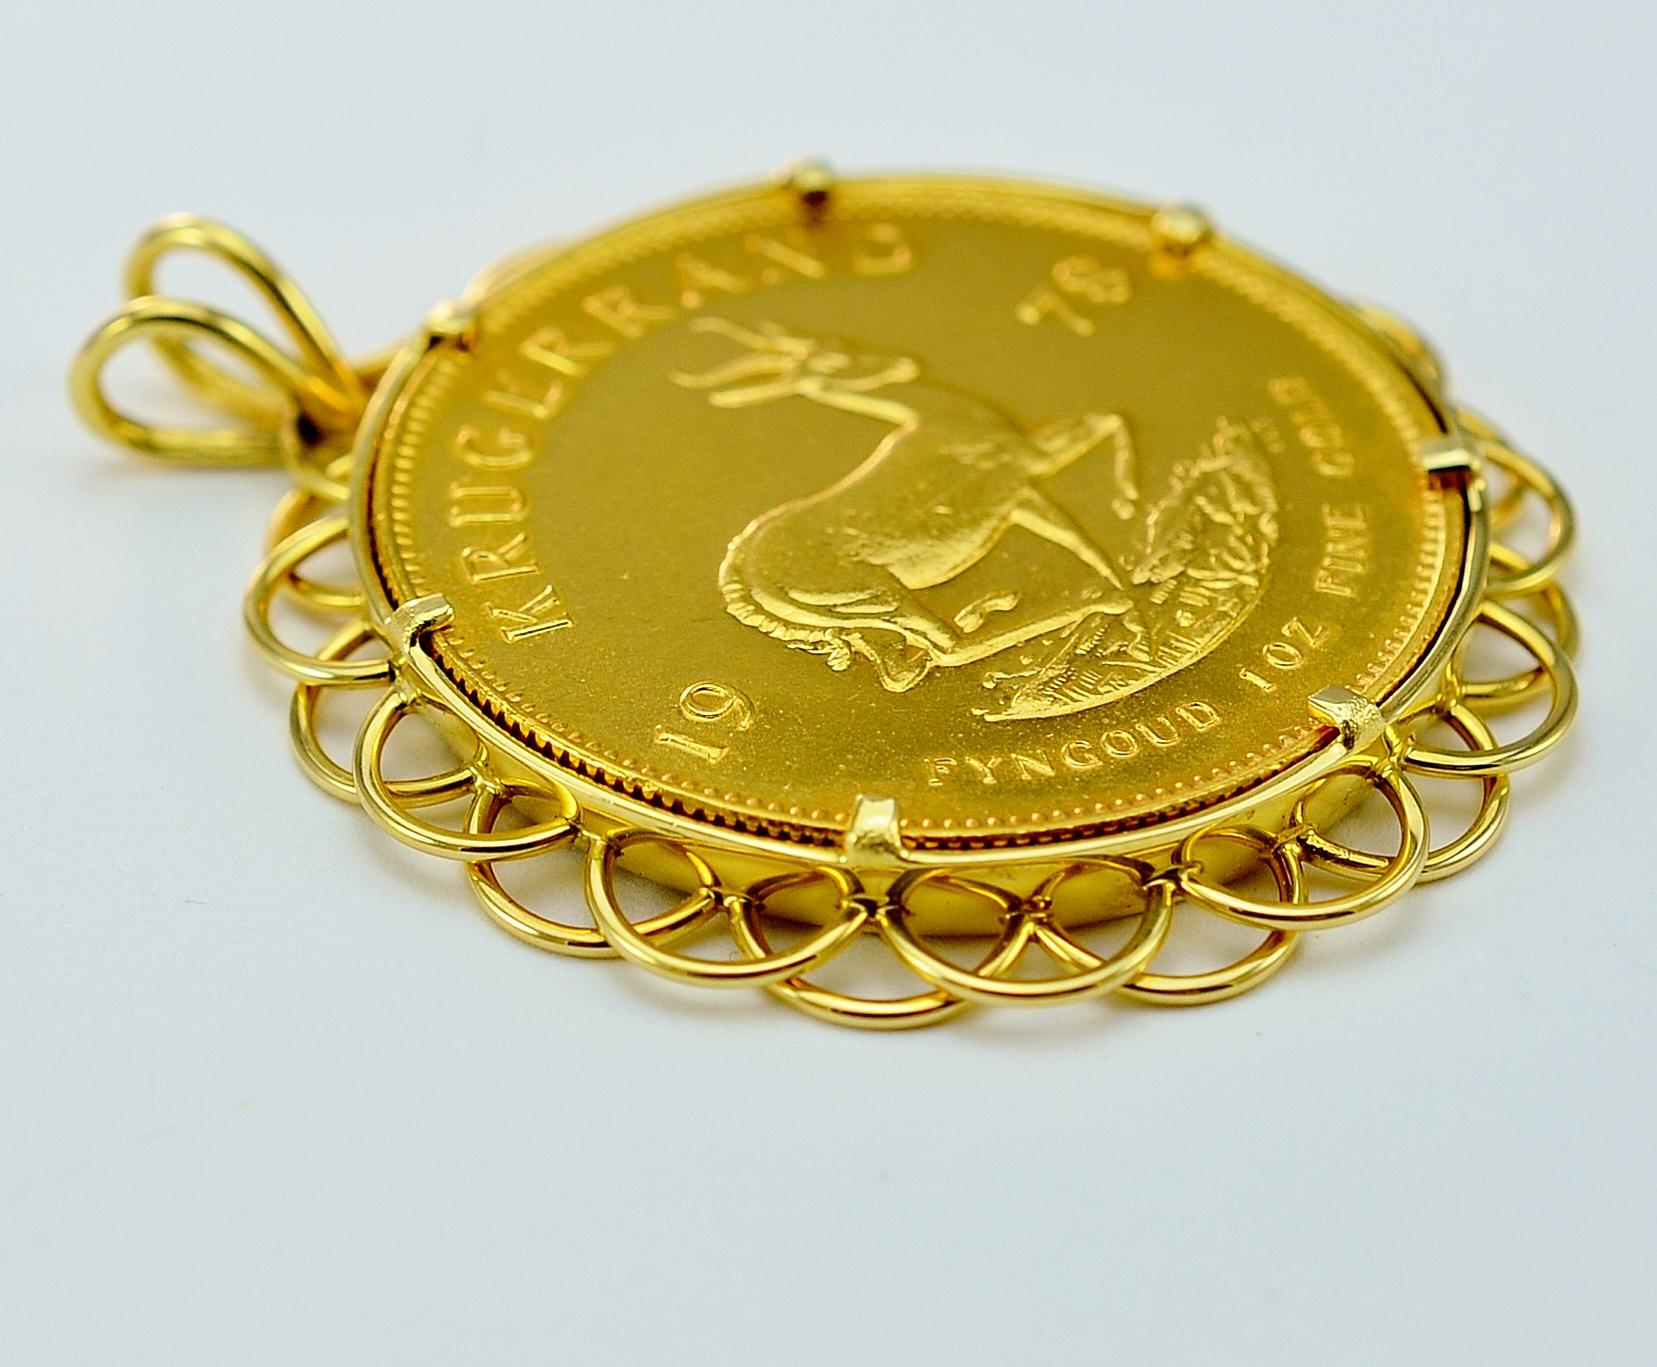 1 Ounce Krugerrand 1978 Fyngoud Fine Gold Suid Afrika South Africa Coin With Custom Made Gold